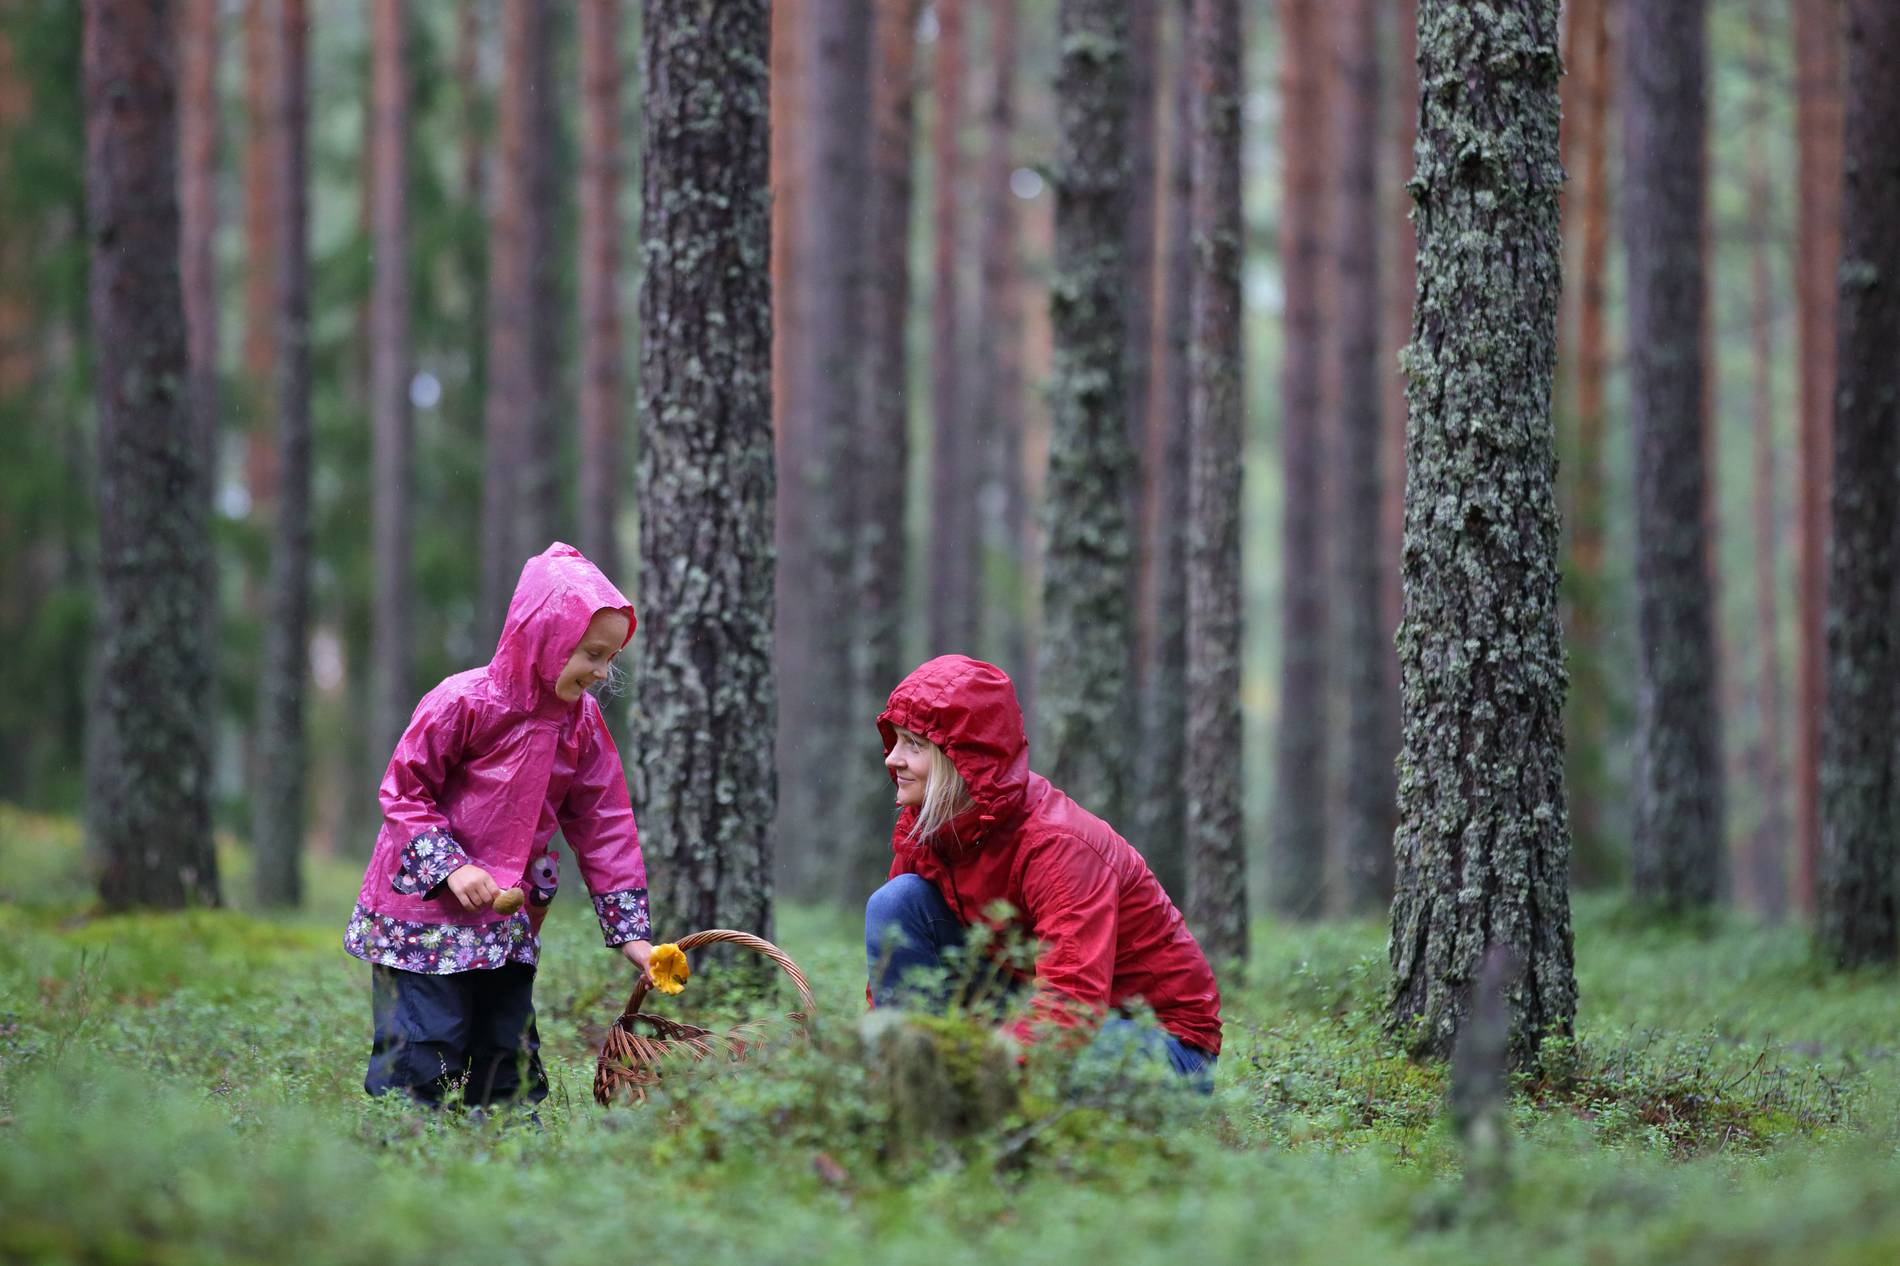 Mushroom picking in the surroundings of Tallinn, Estonia